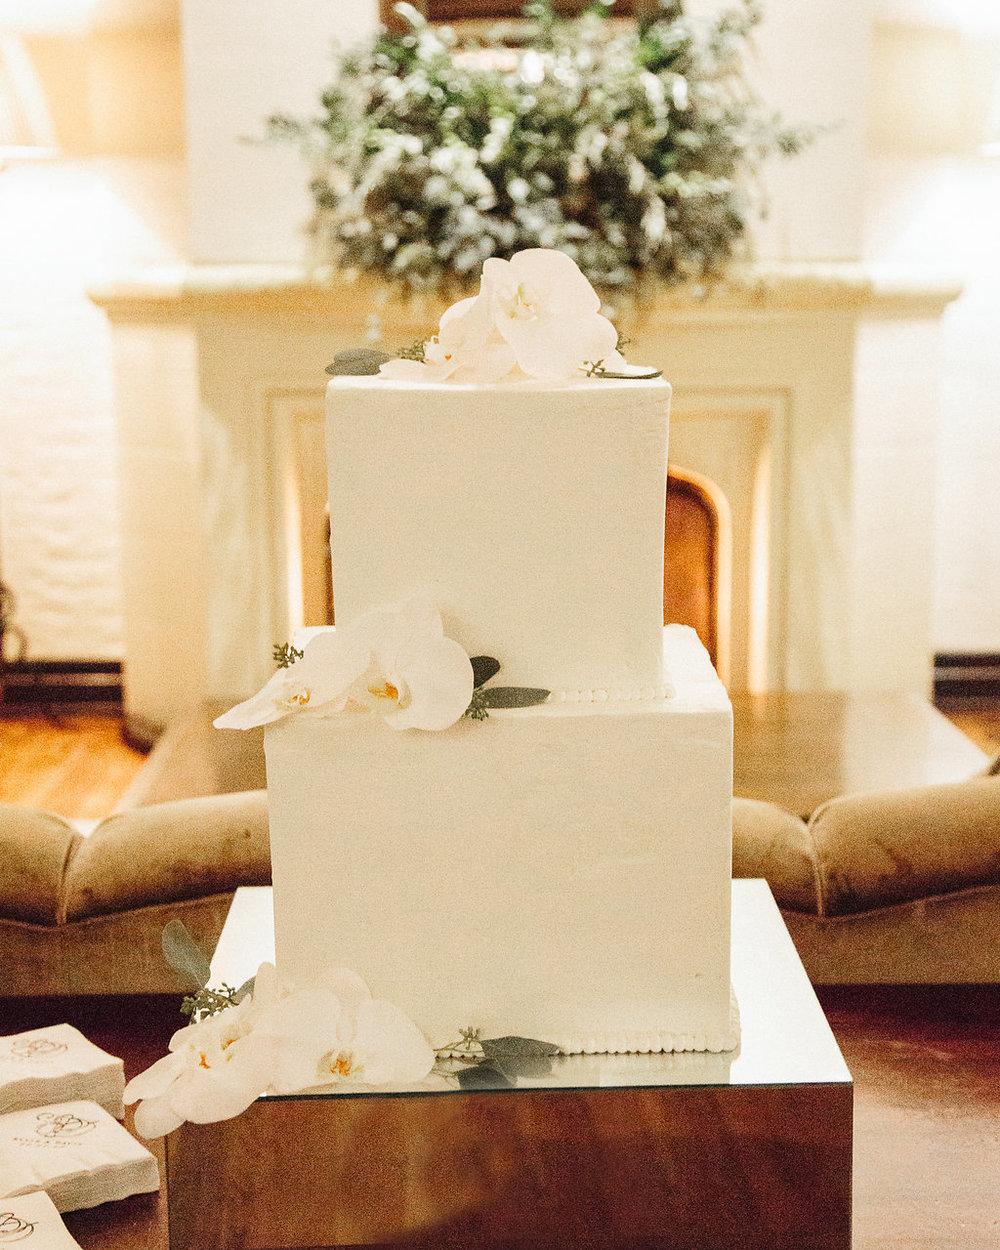 Handley Breaux Designs   Southern Wedding Planner, Southern Wedding, Southern Bride, Alabama Wedding Planner, Alabama Bride, Alabama Wedding, Birmingham Bride, Birmingham Wedding, Birmingham Wedding Planner